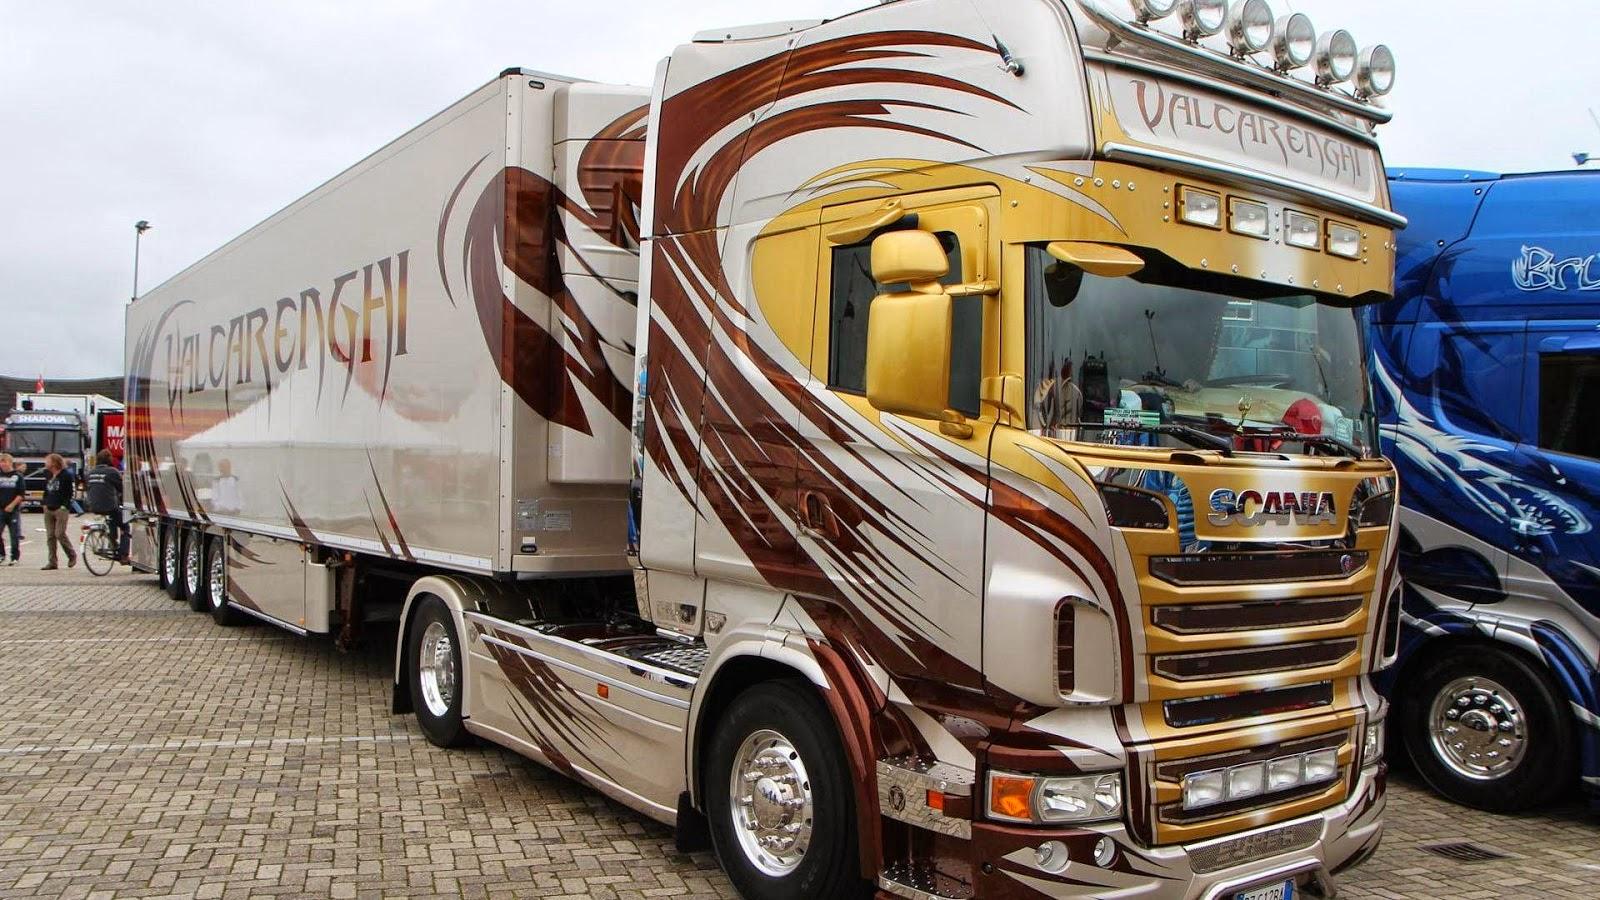 Gambar Modifikasi Truk Volvo 66 Koleksi Modifikasi Mobil Truk Volvo Truk Modifikasi